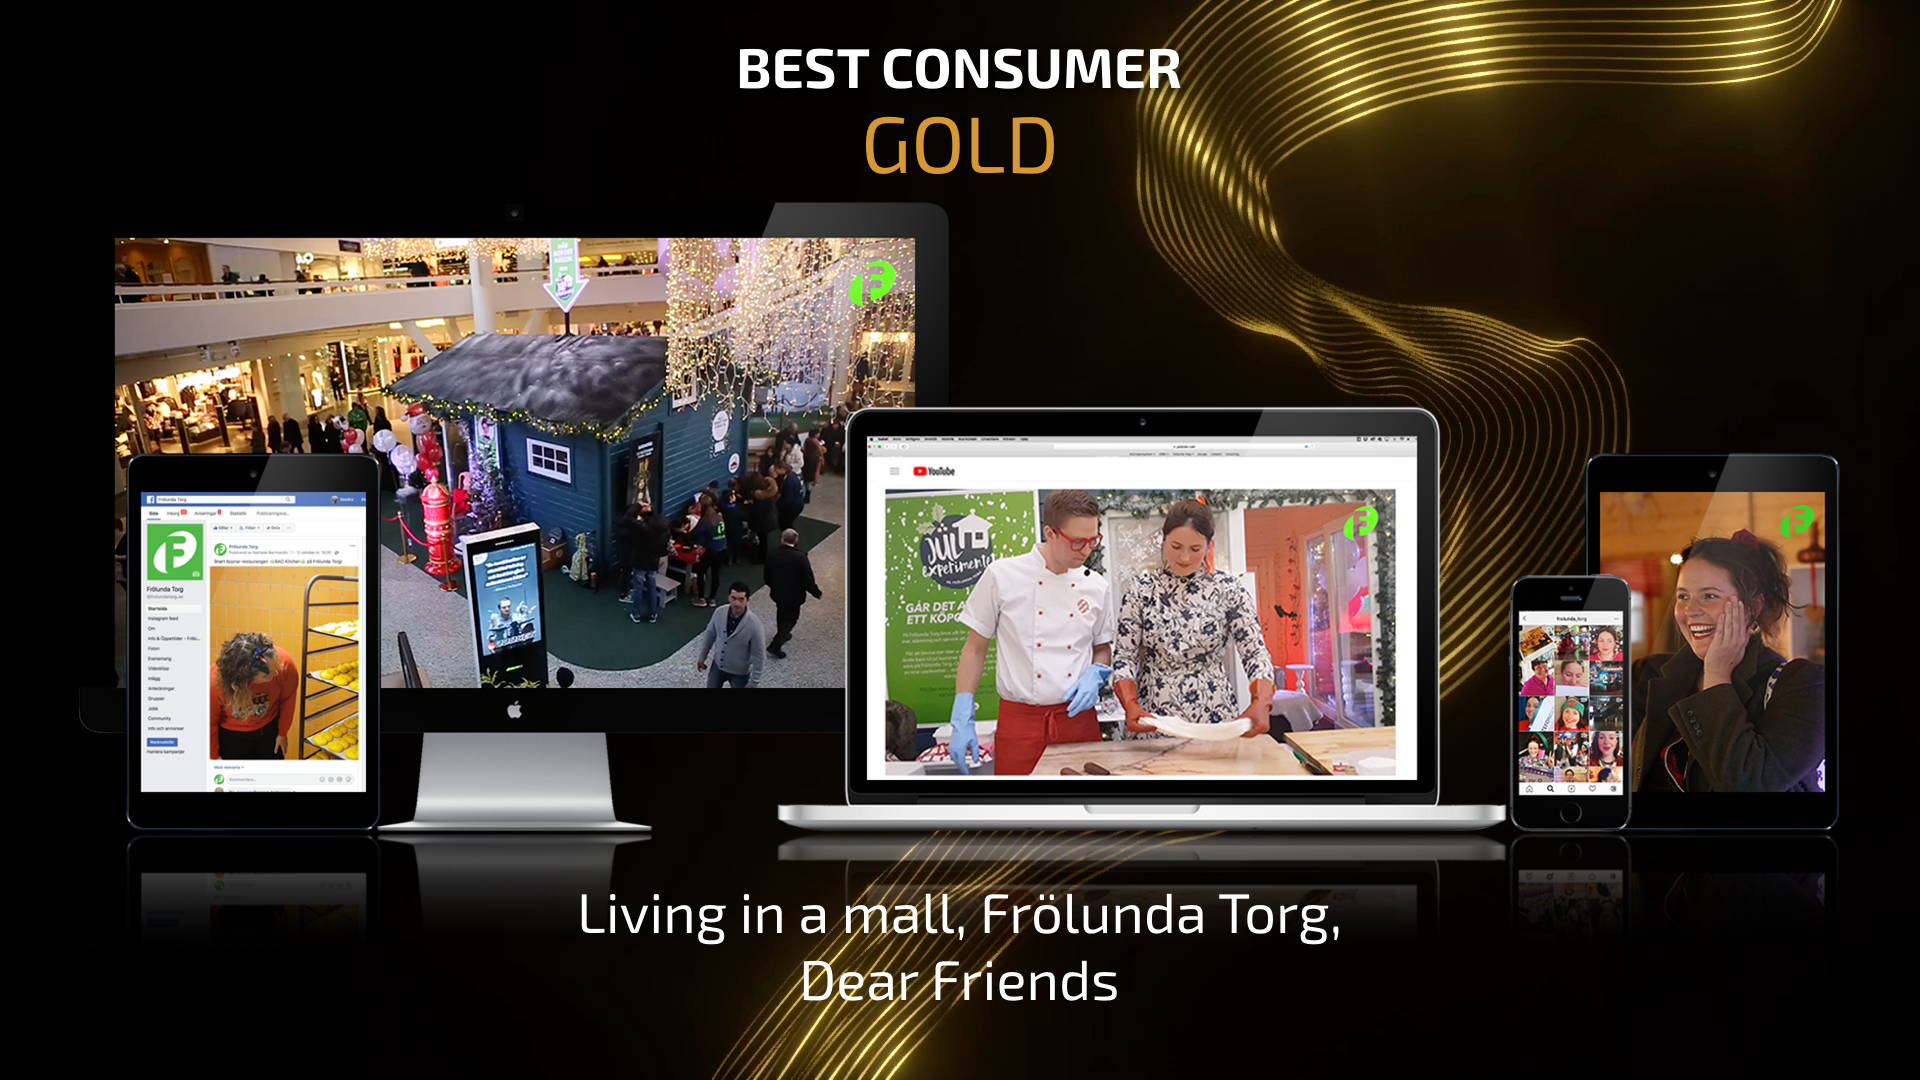 Best Consumer - Gold